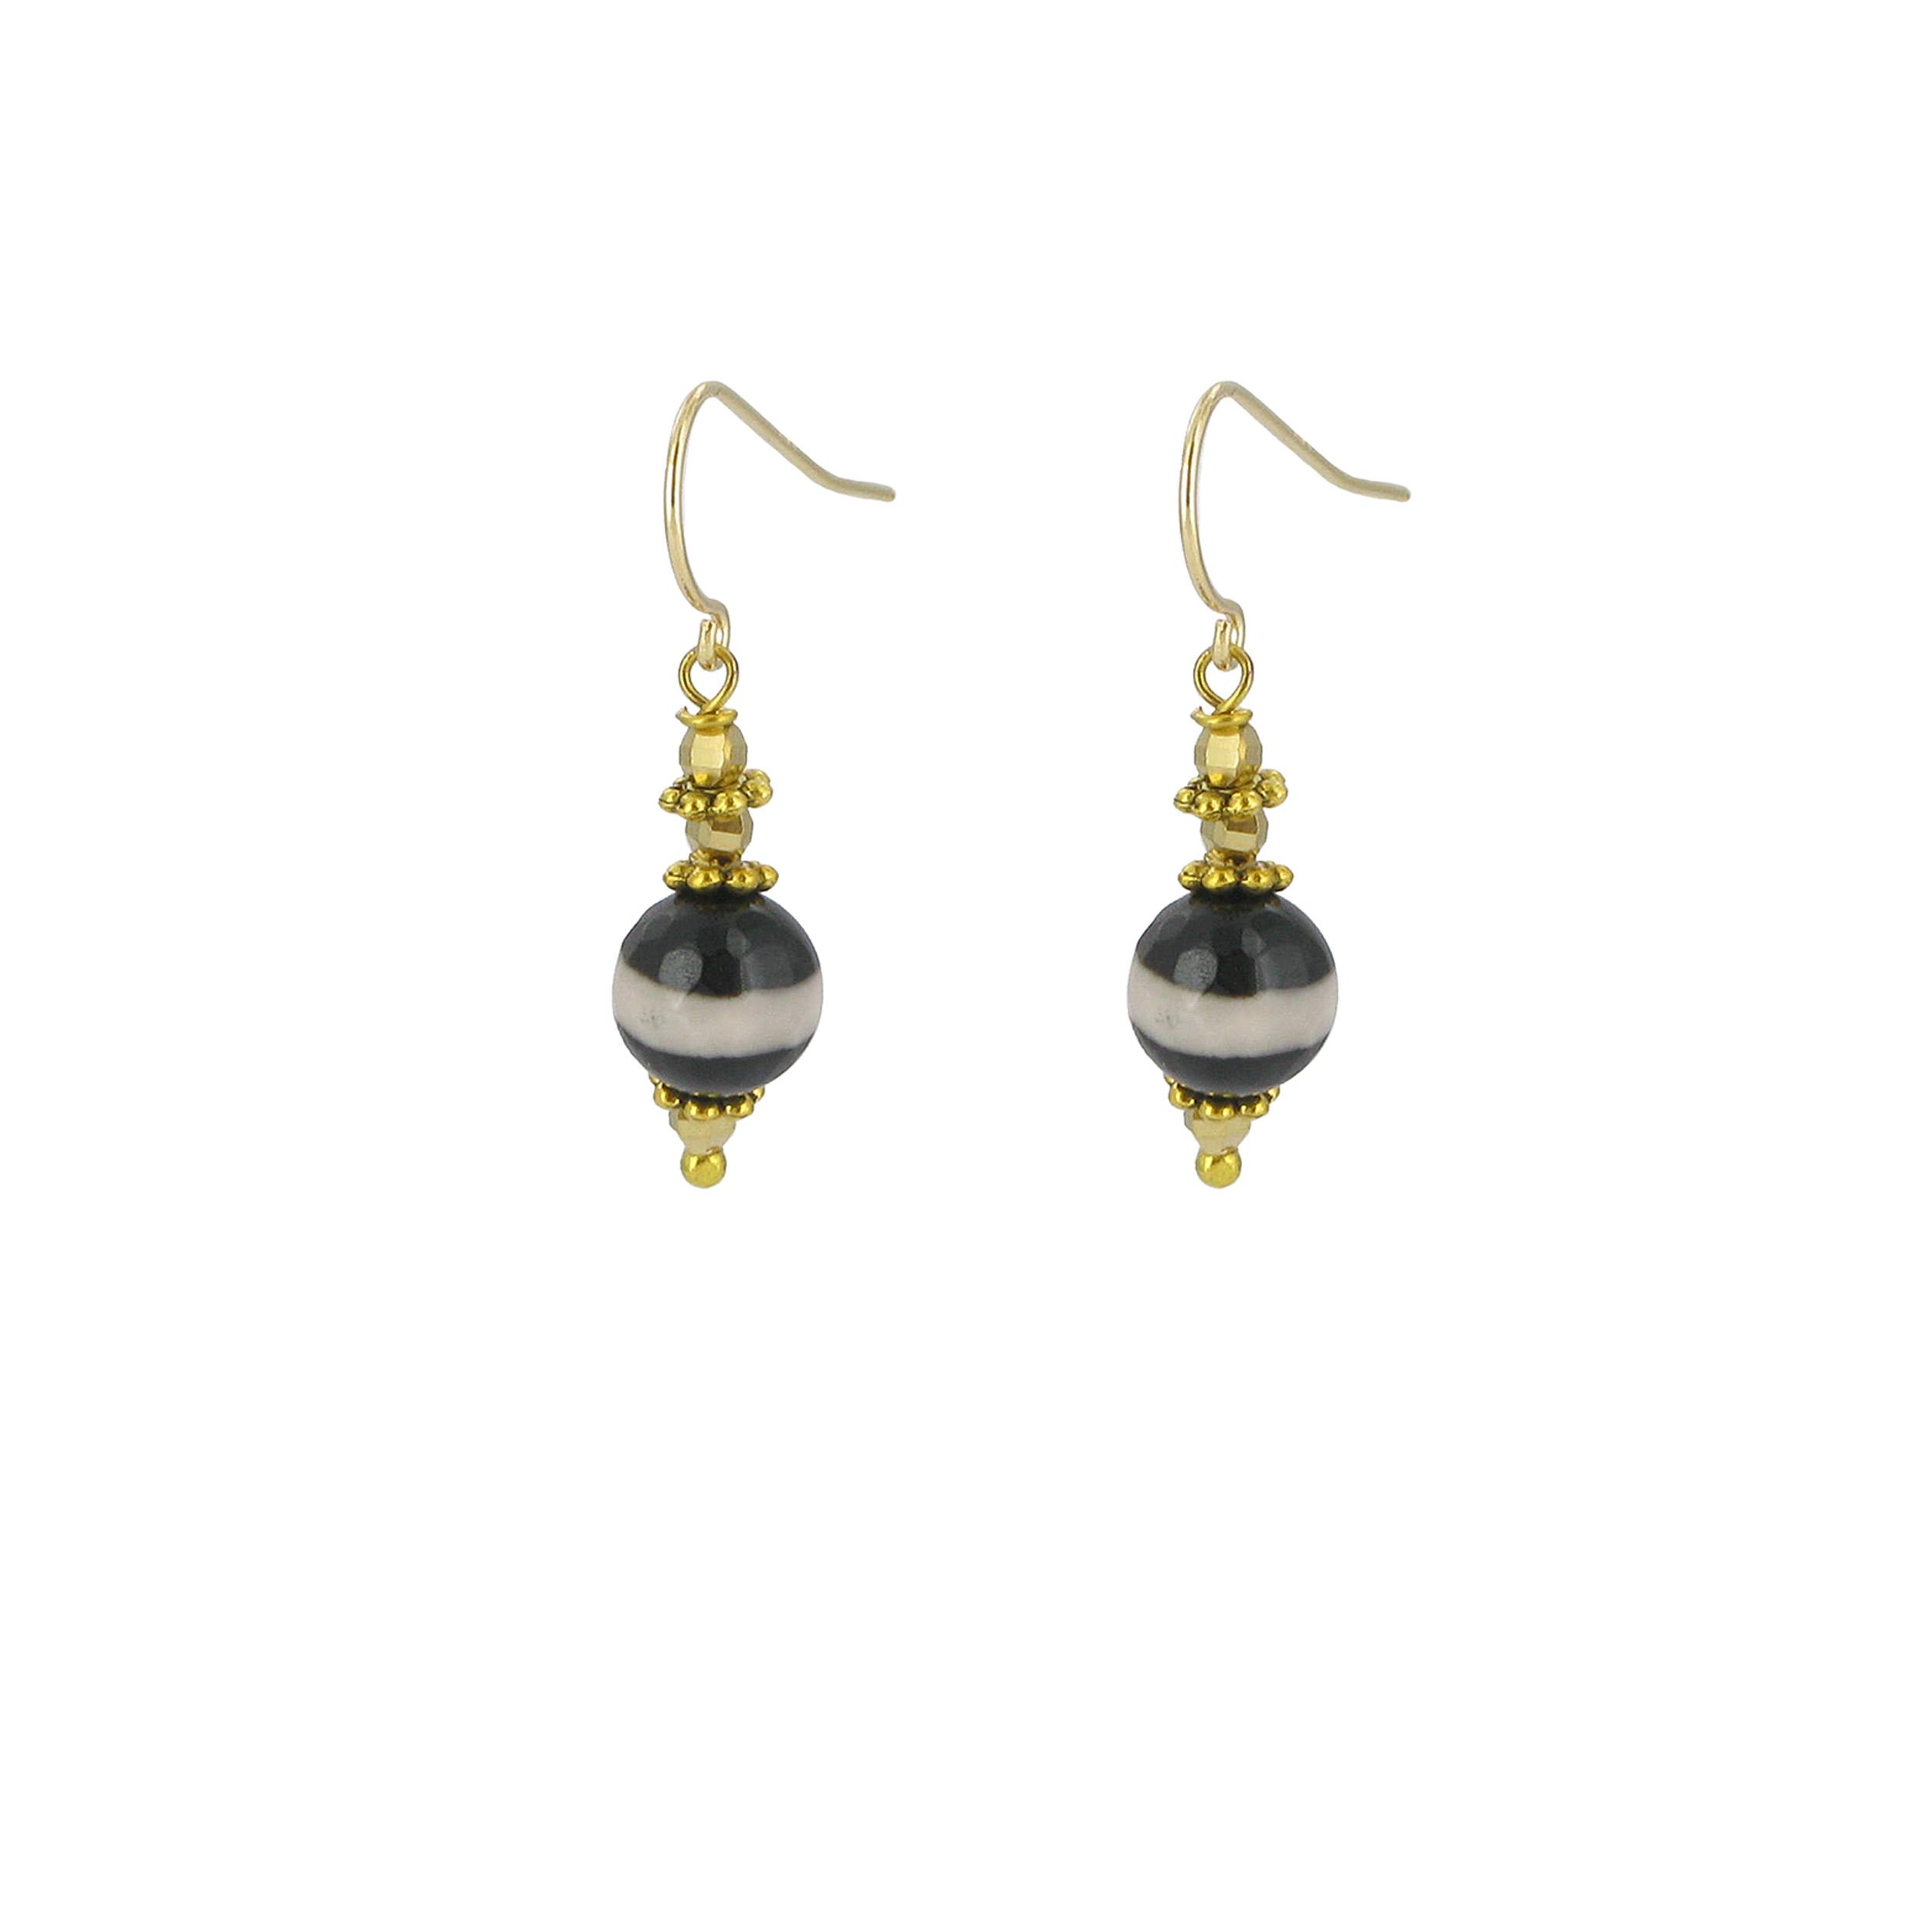 Black and white agate drop earrings